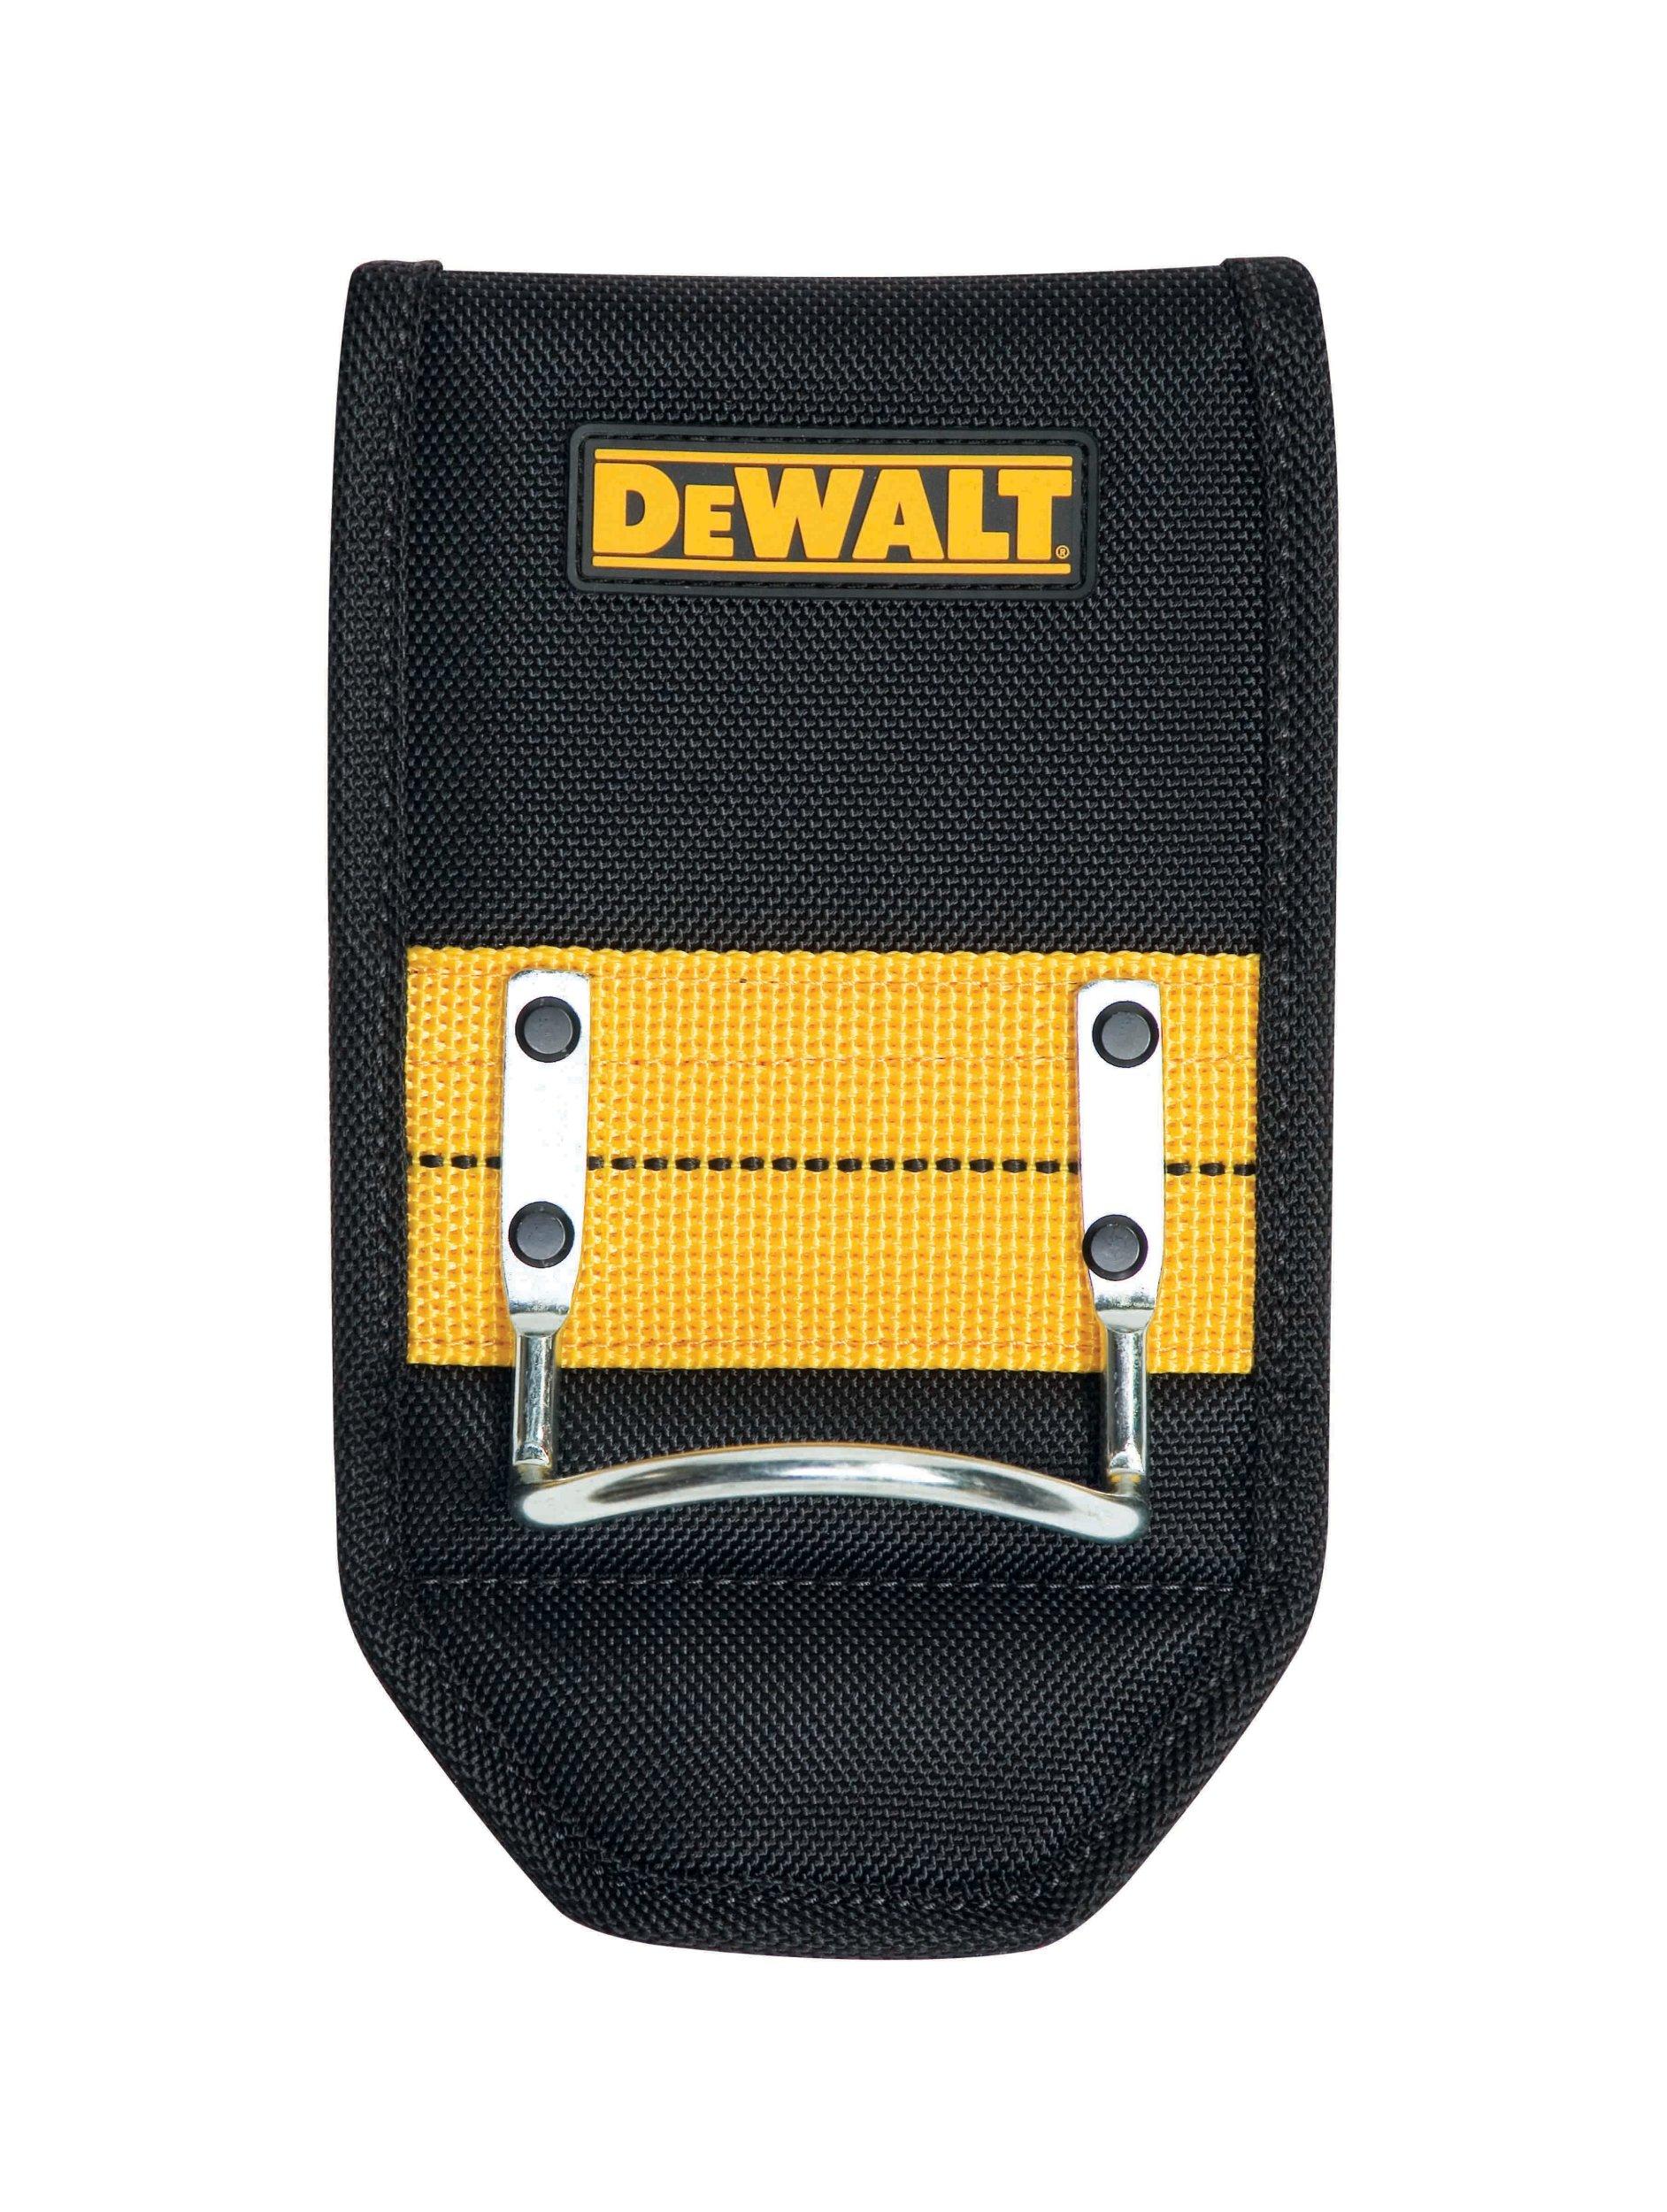 DEWALT DG5139 Heavy-duty Hammer Holder